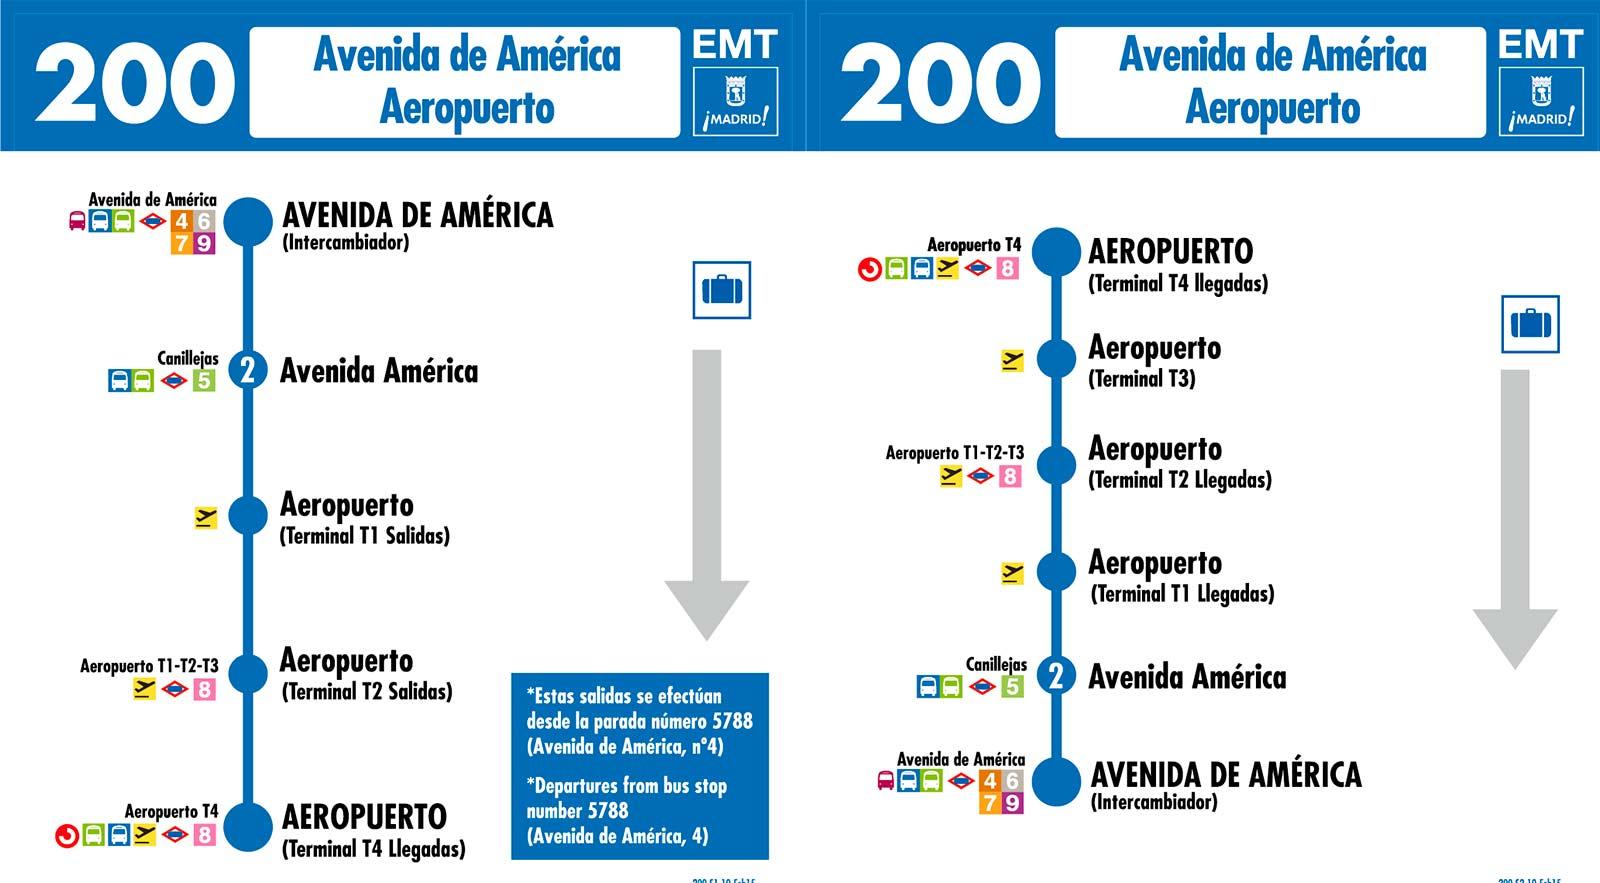 Avenida-de-América---Airport-Мадрид